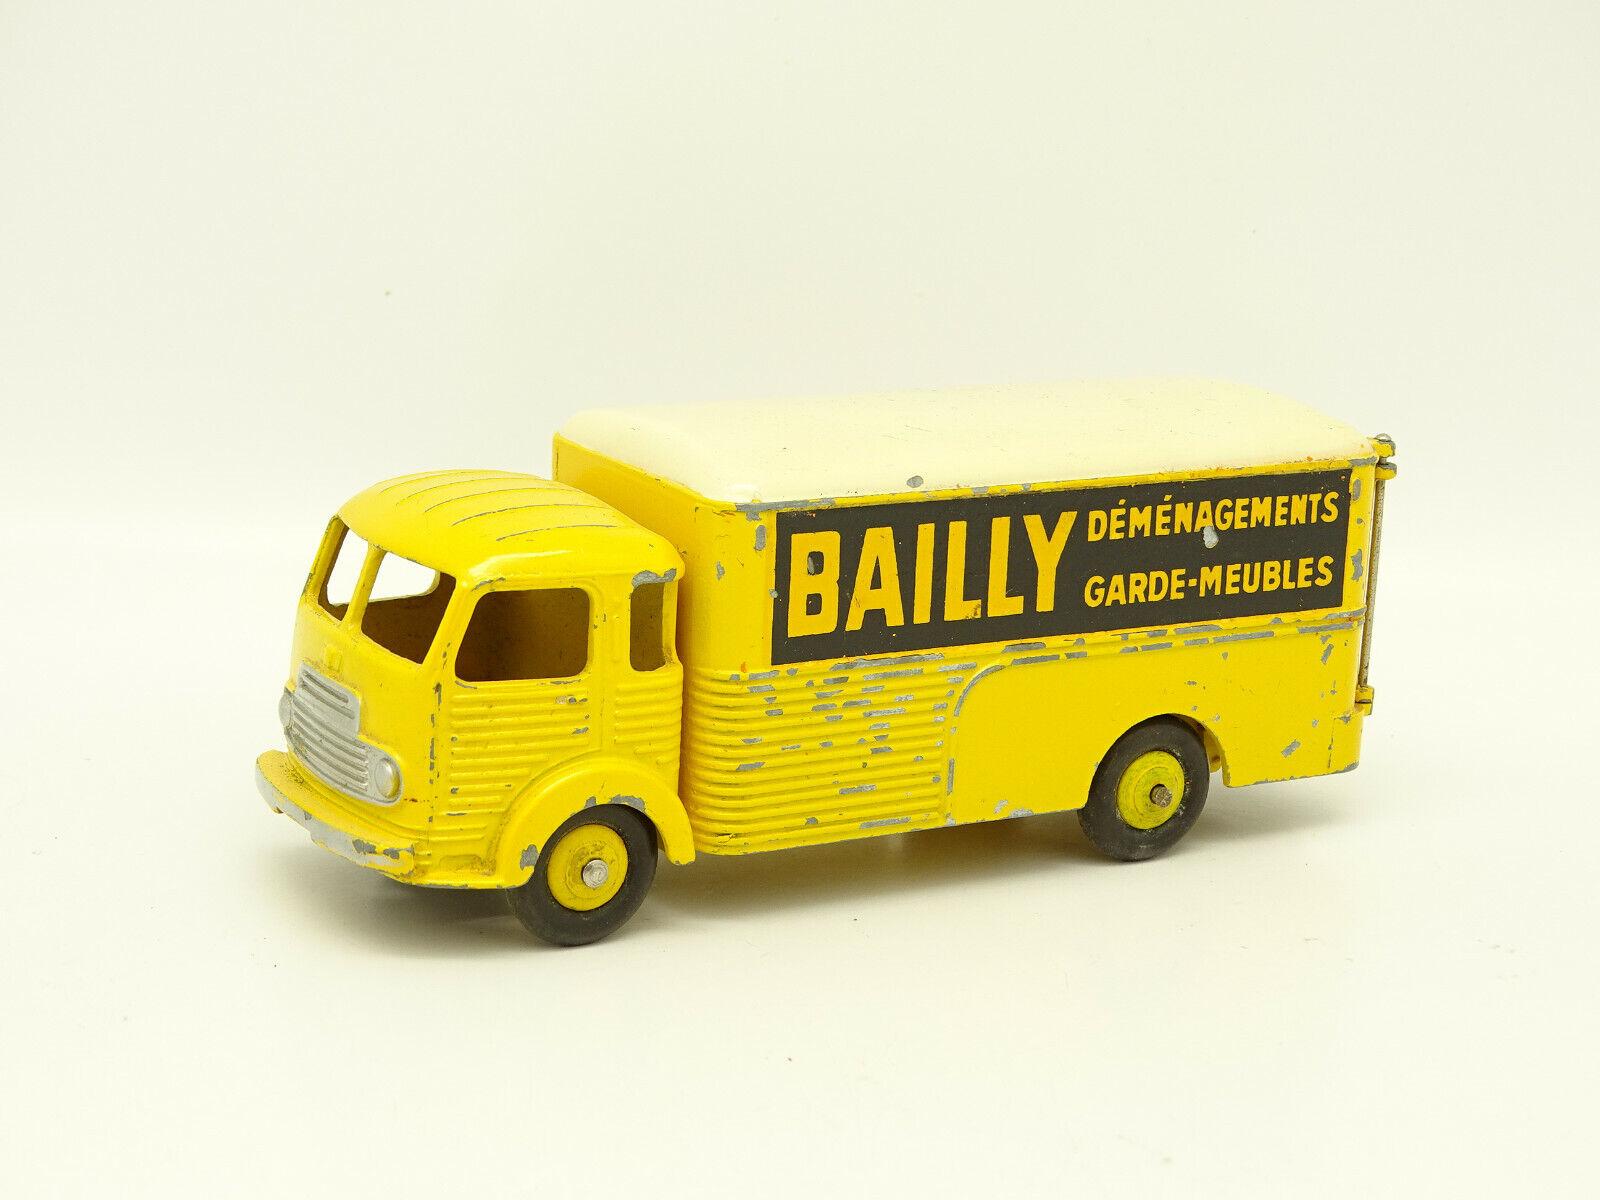 Dinky toys SB 1 43 - Simca Cargo 33 Bailly